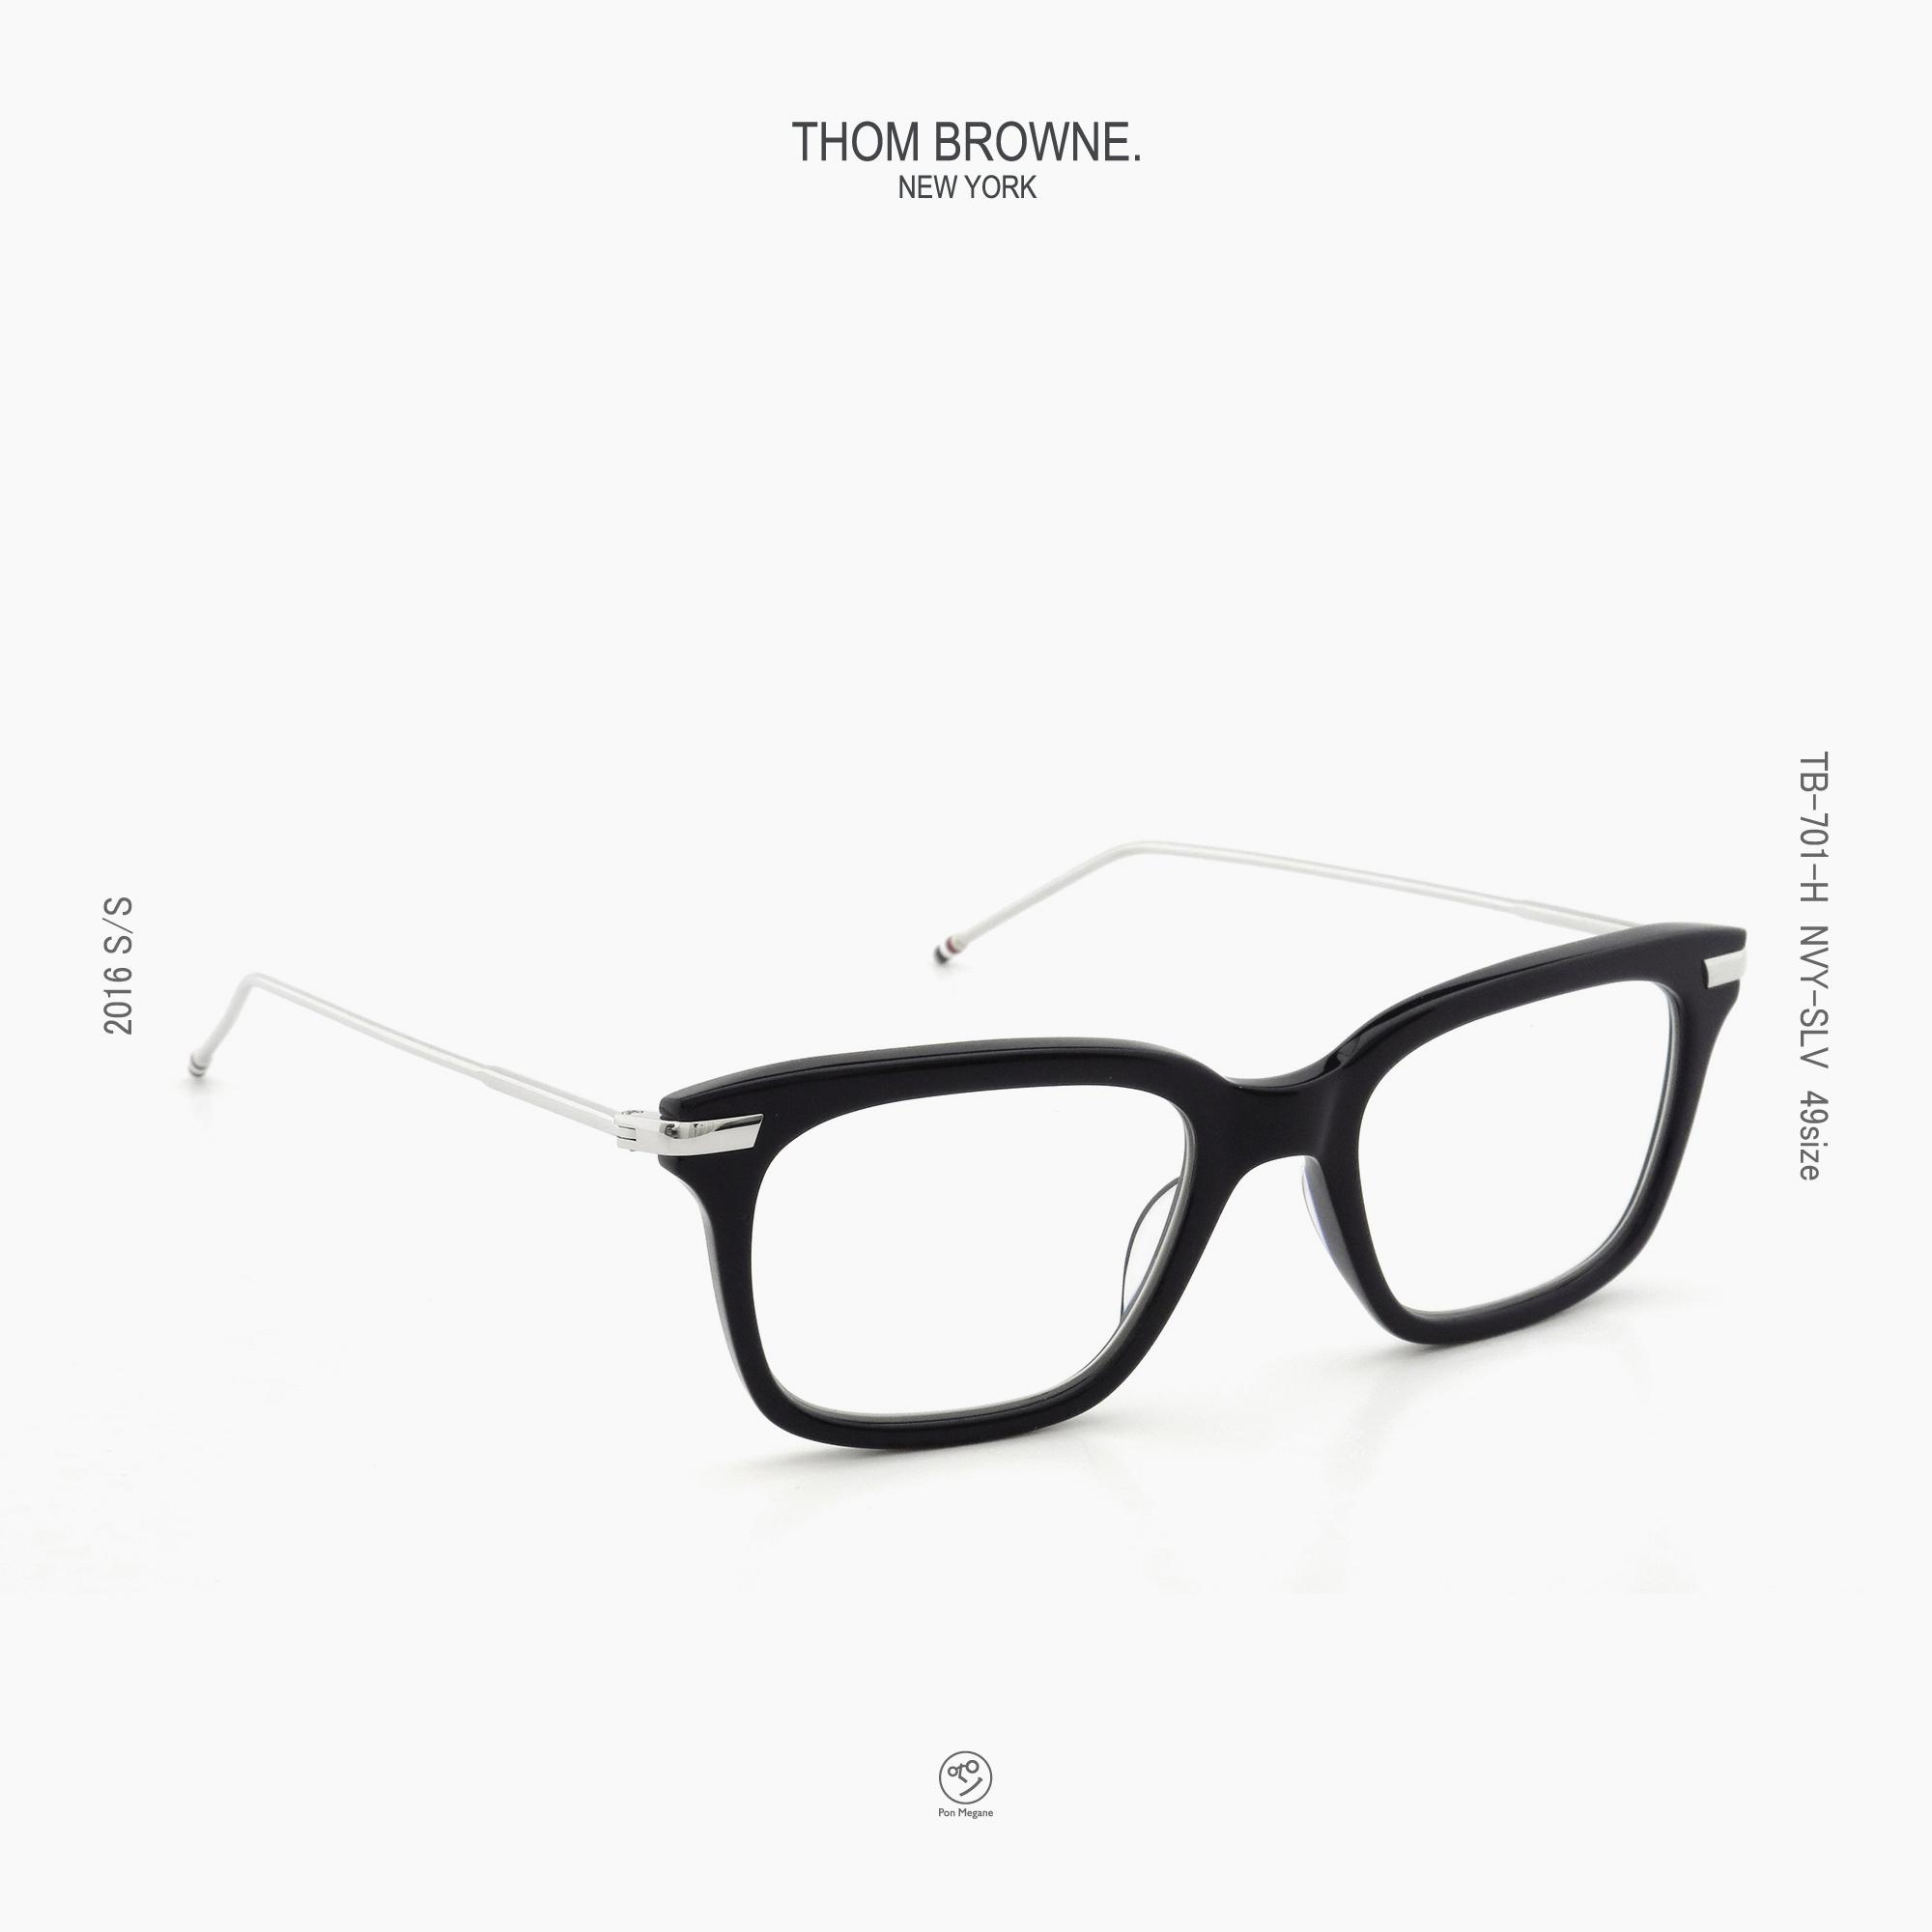 THOM-BROWNE_TB-701-H_NVY-SLV_49_insta